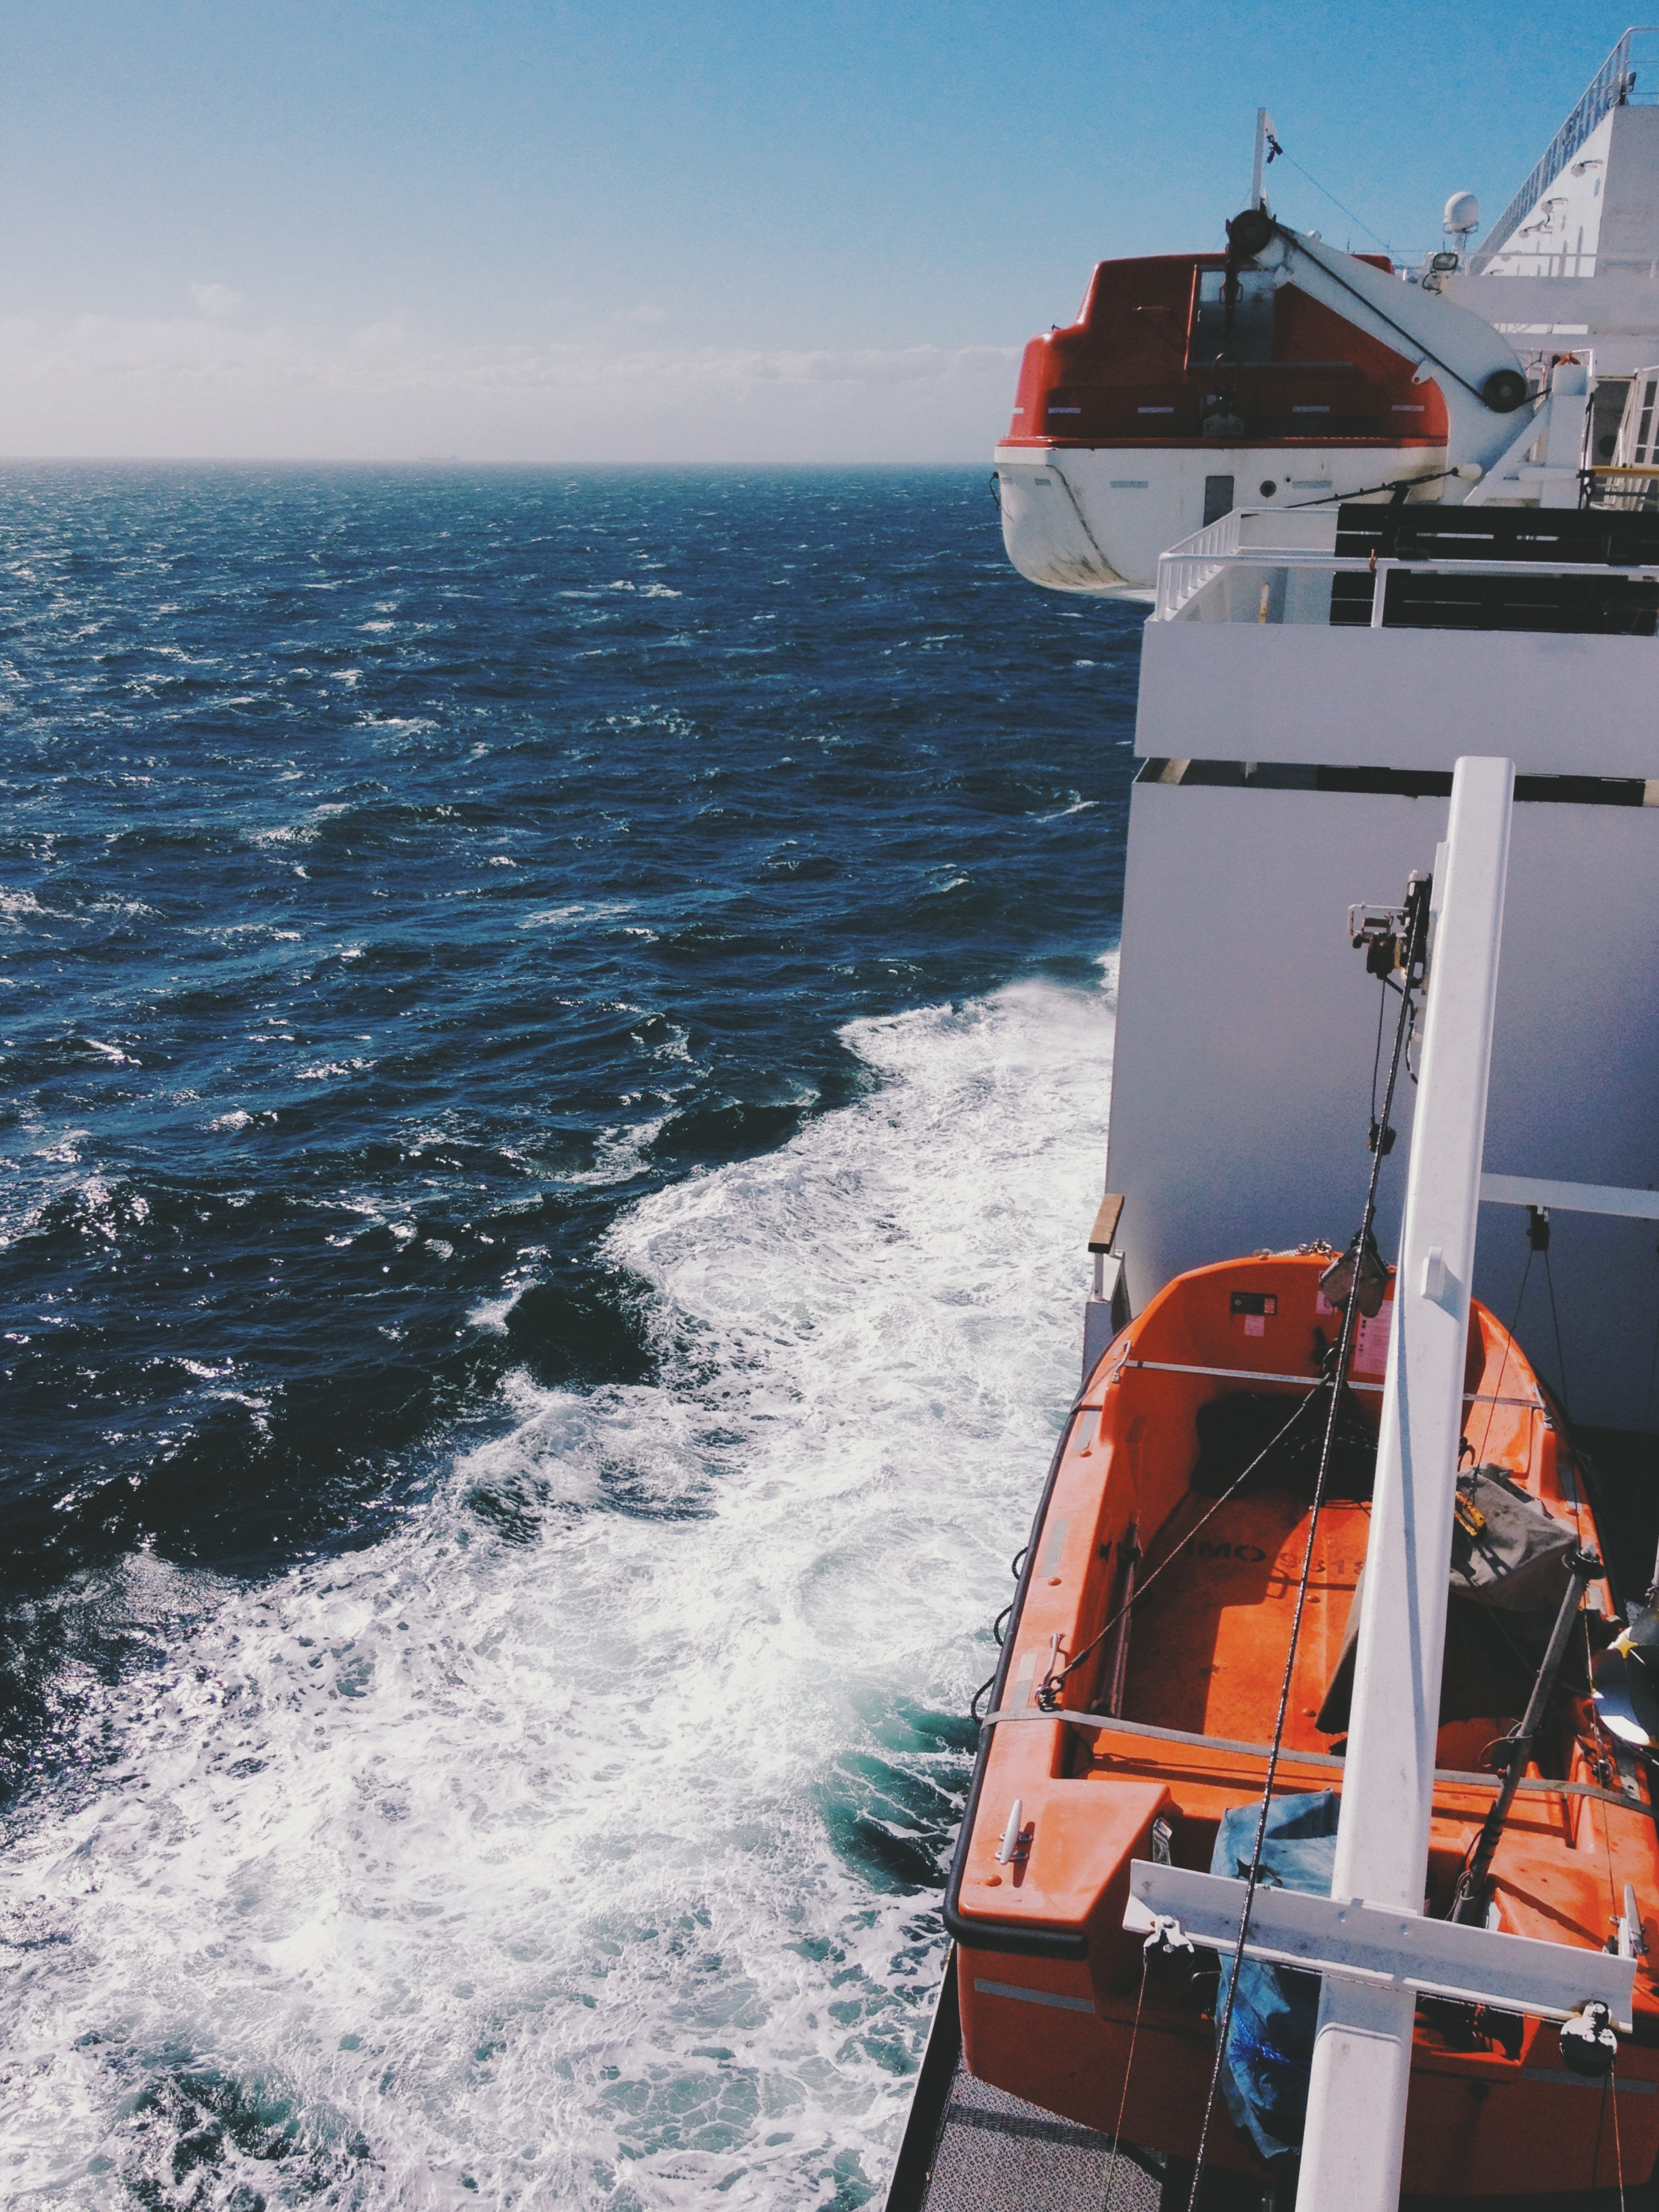 Life Boat, Boat, Life, River, Sea, HQ Photo